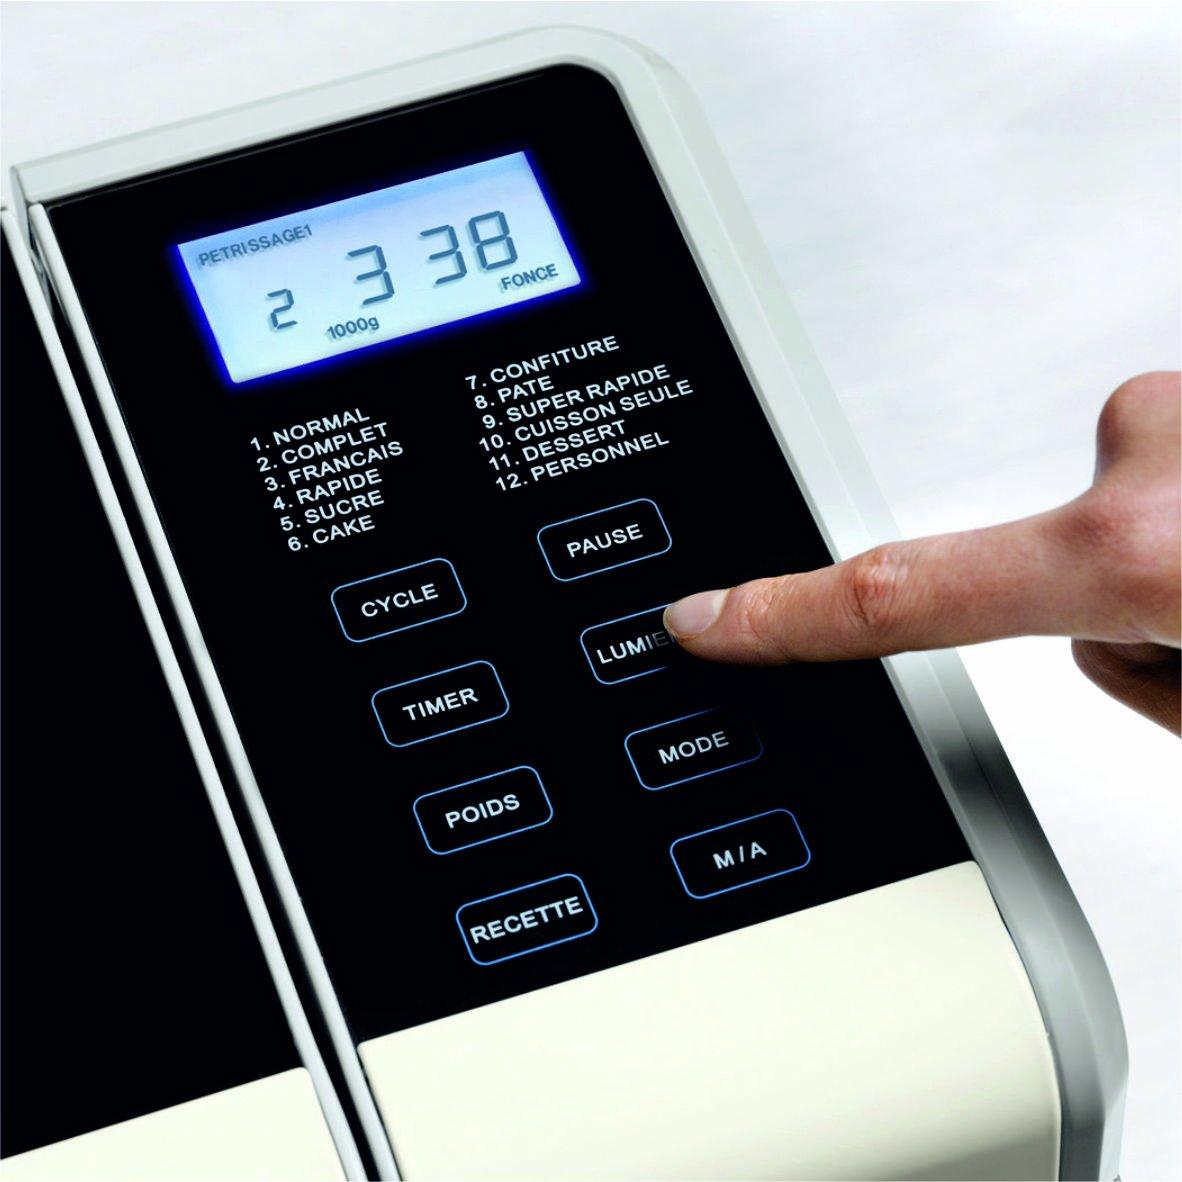 Riviera & Bar QD782A - Panificadora automática (600 W, 3 tamaños de pan): Amazon.es: Hogar